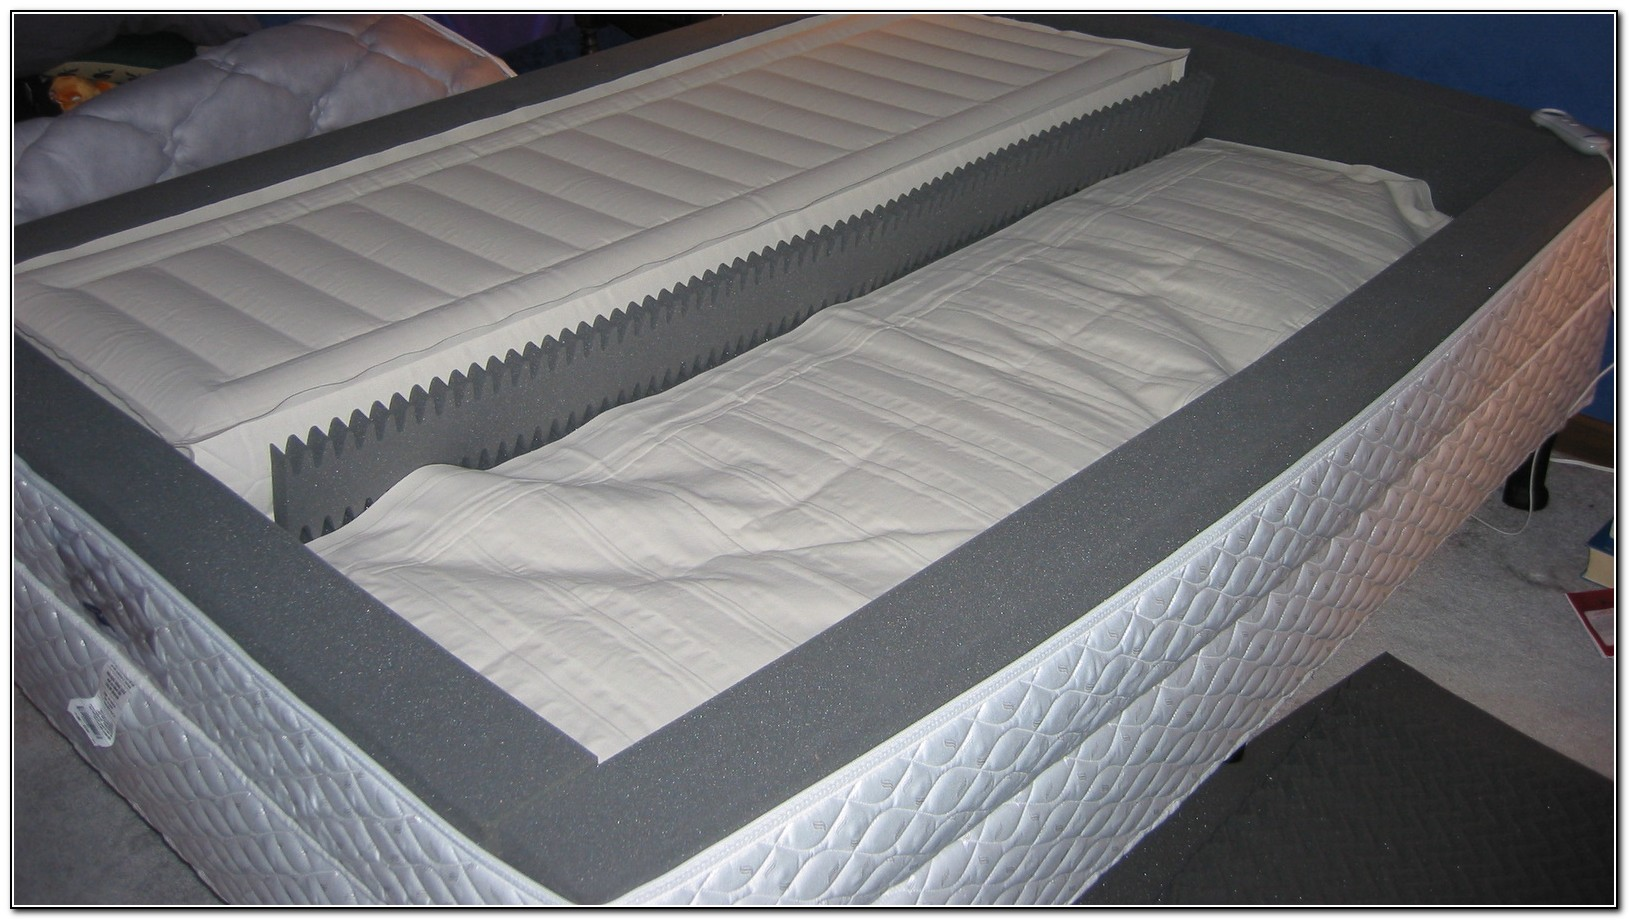 Sleep Number Bed Owners Manual